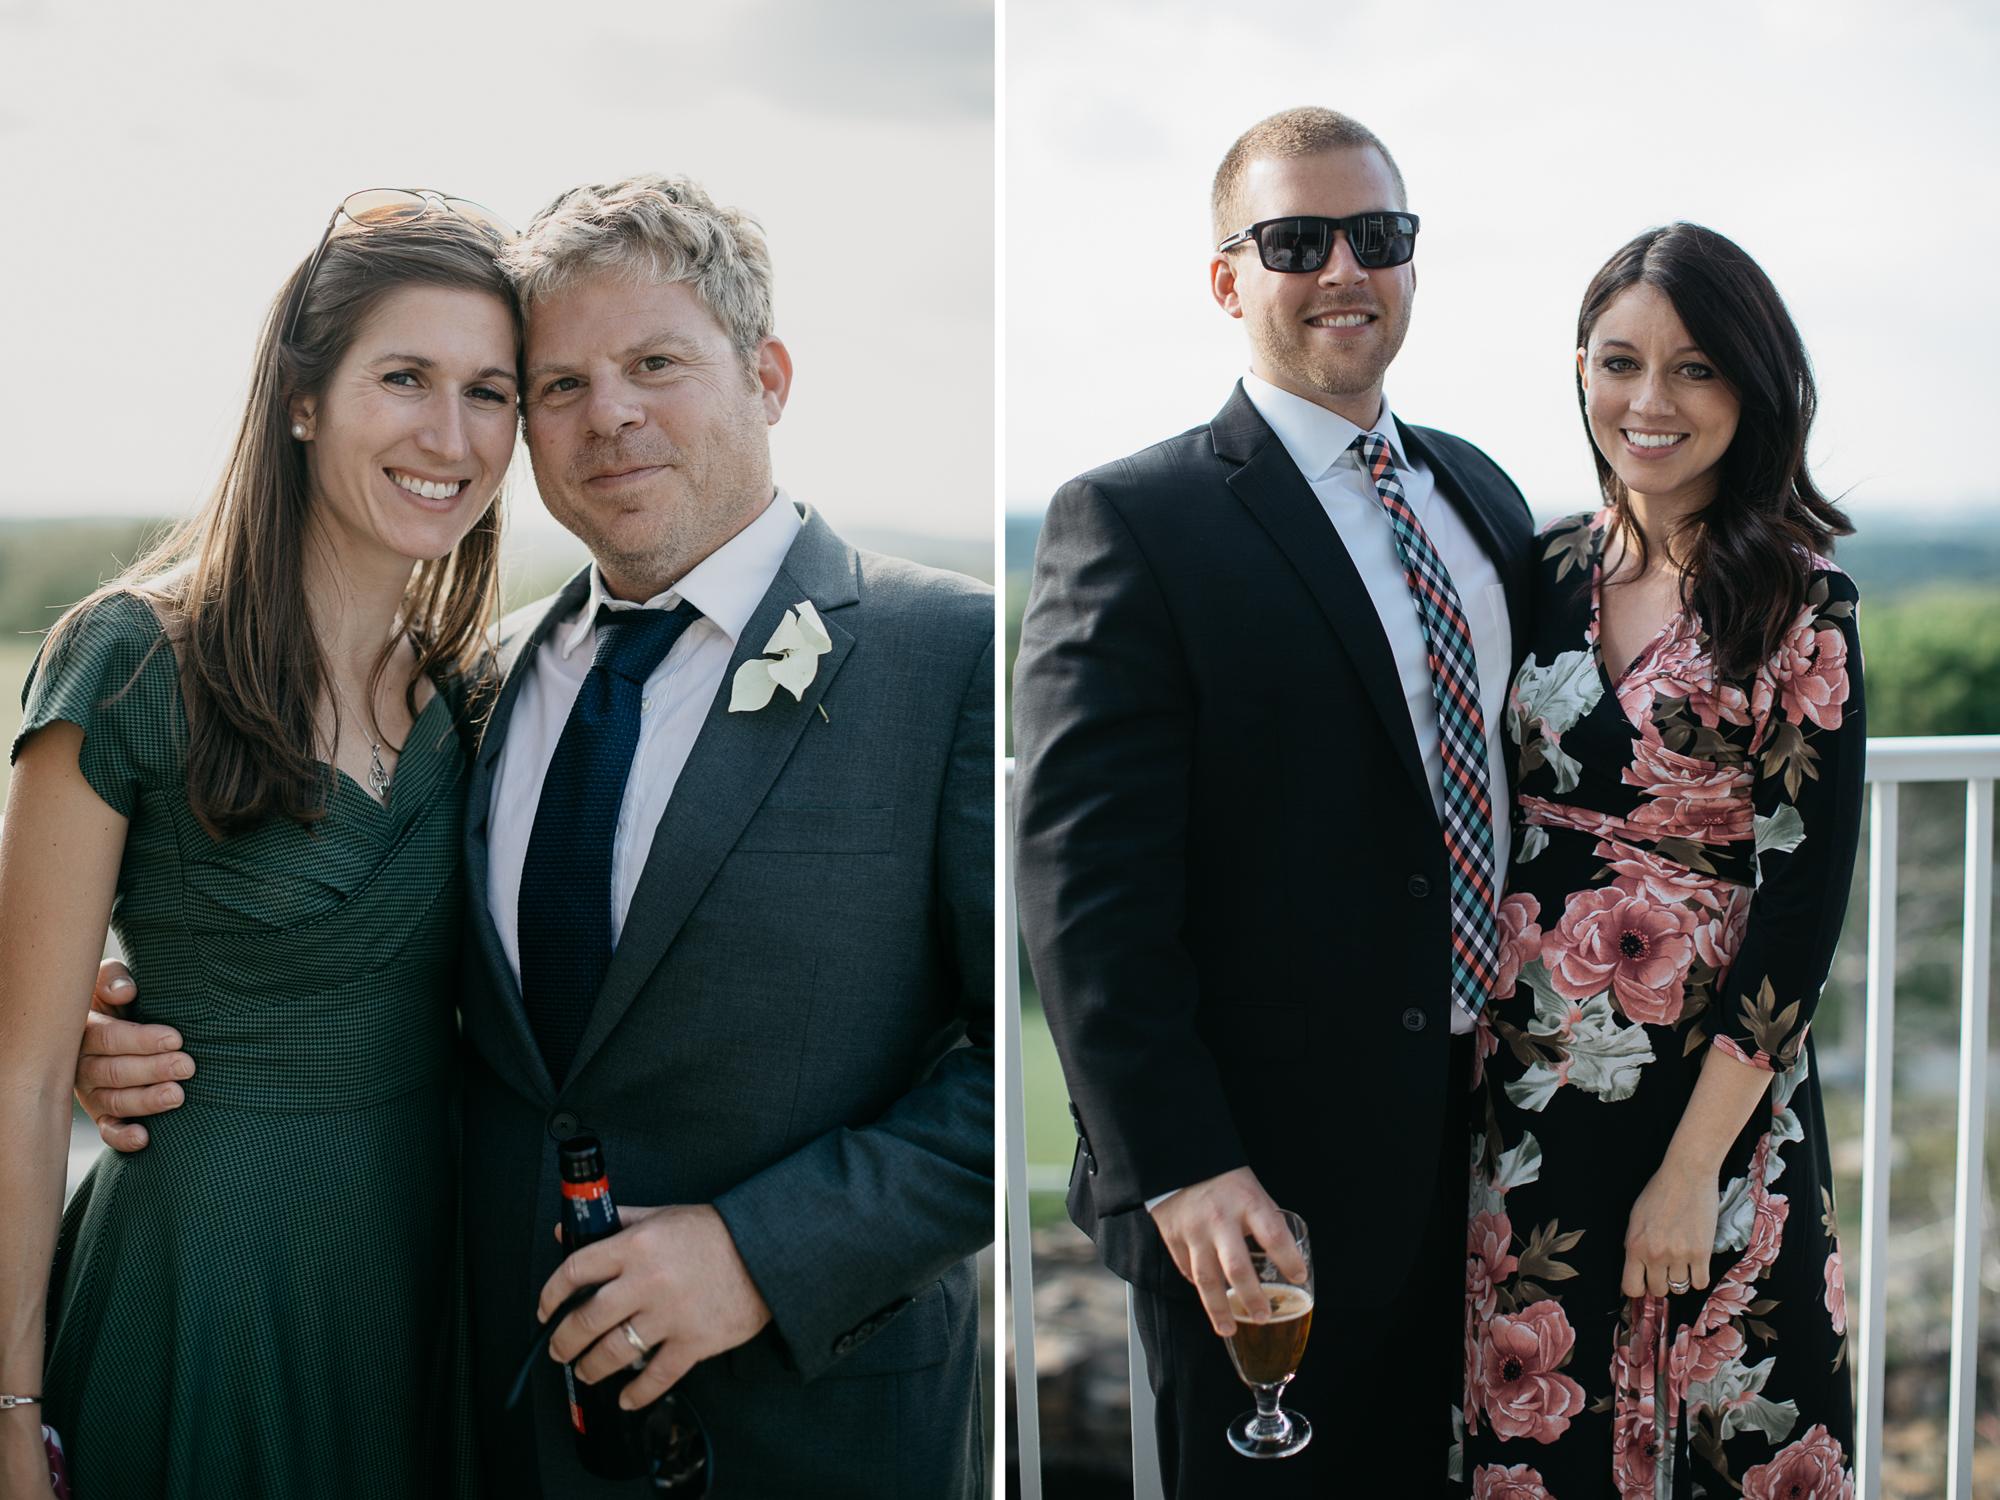 Jaclyn_Andrew_quincy_massachusetts_wedding024.jpg